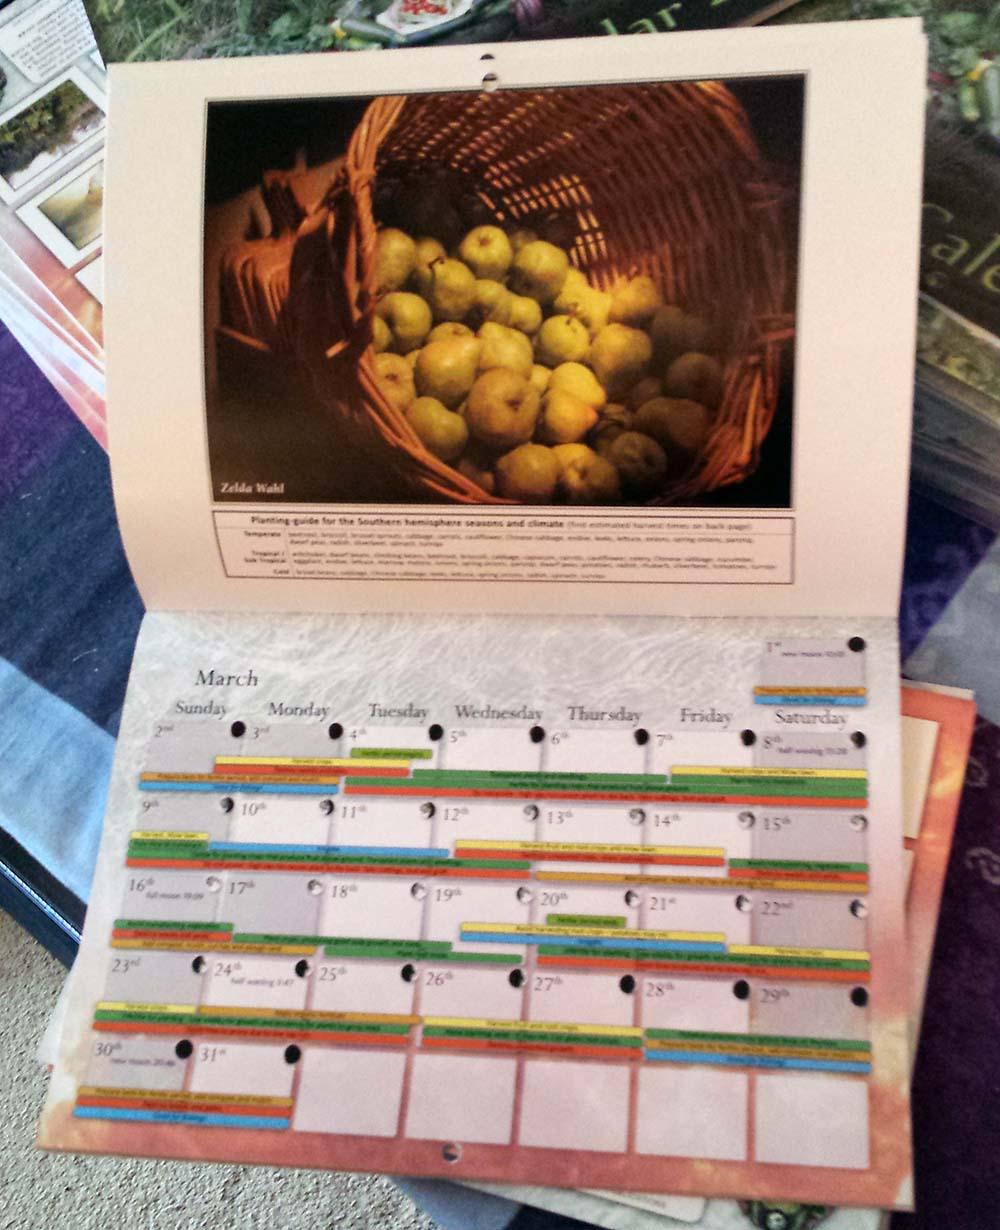 2014 Planting calendar website 2